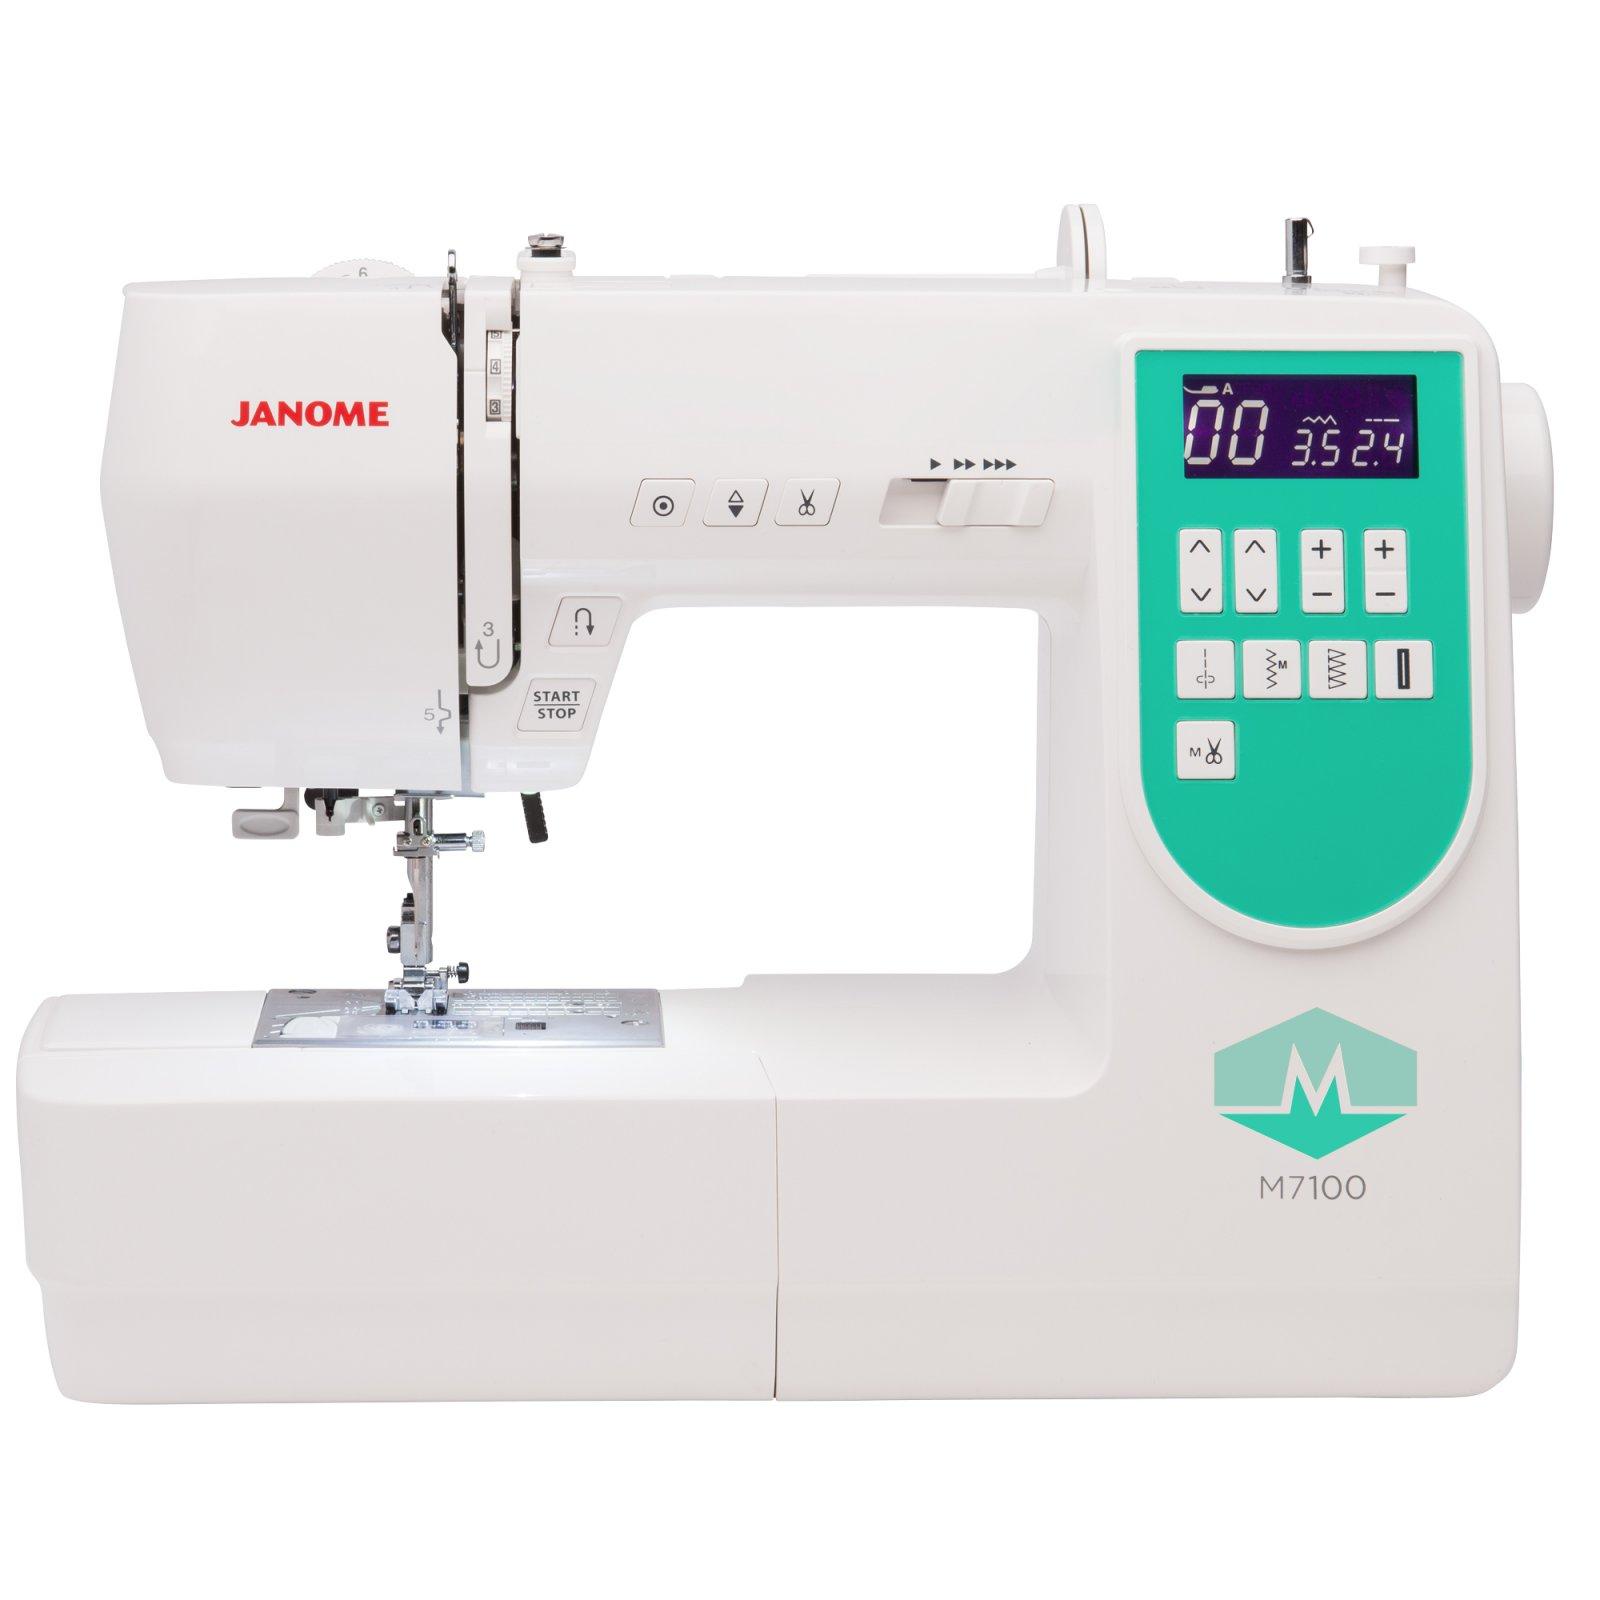 Janome M7100